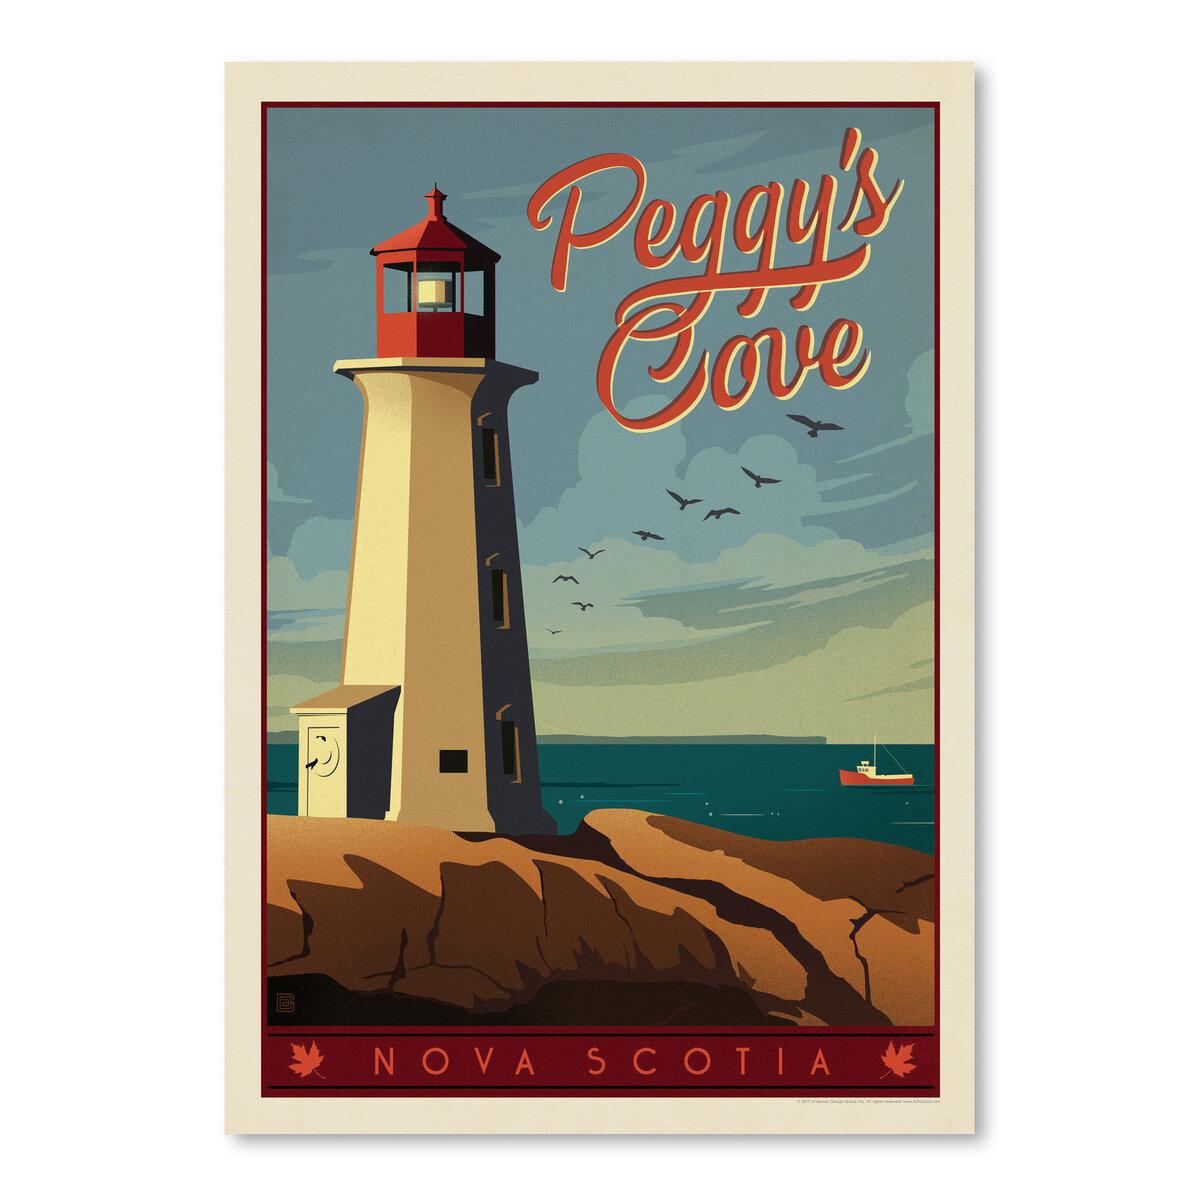 East Urban Home Canada Peggys Cove Graphic Art Print